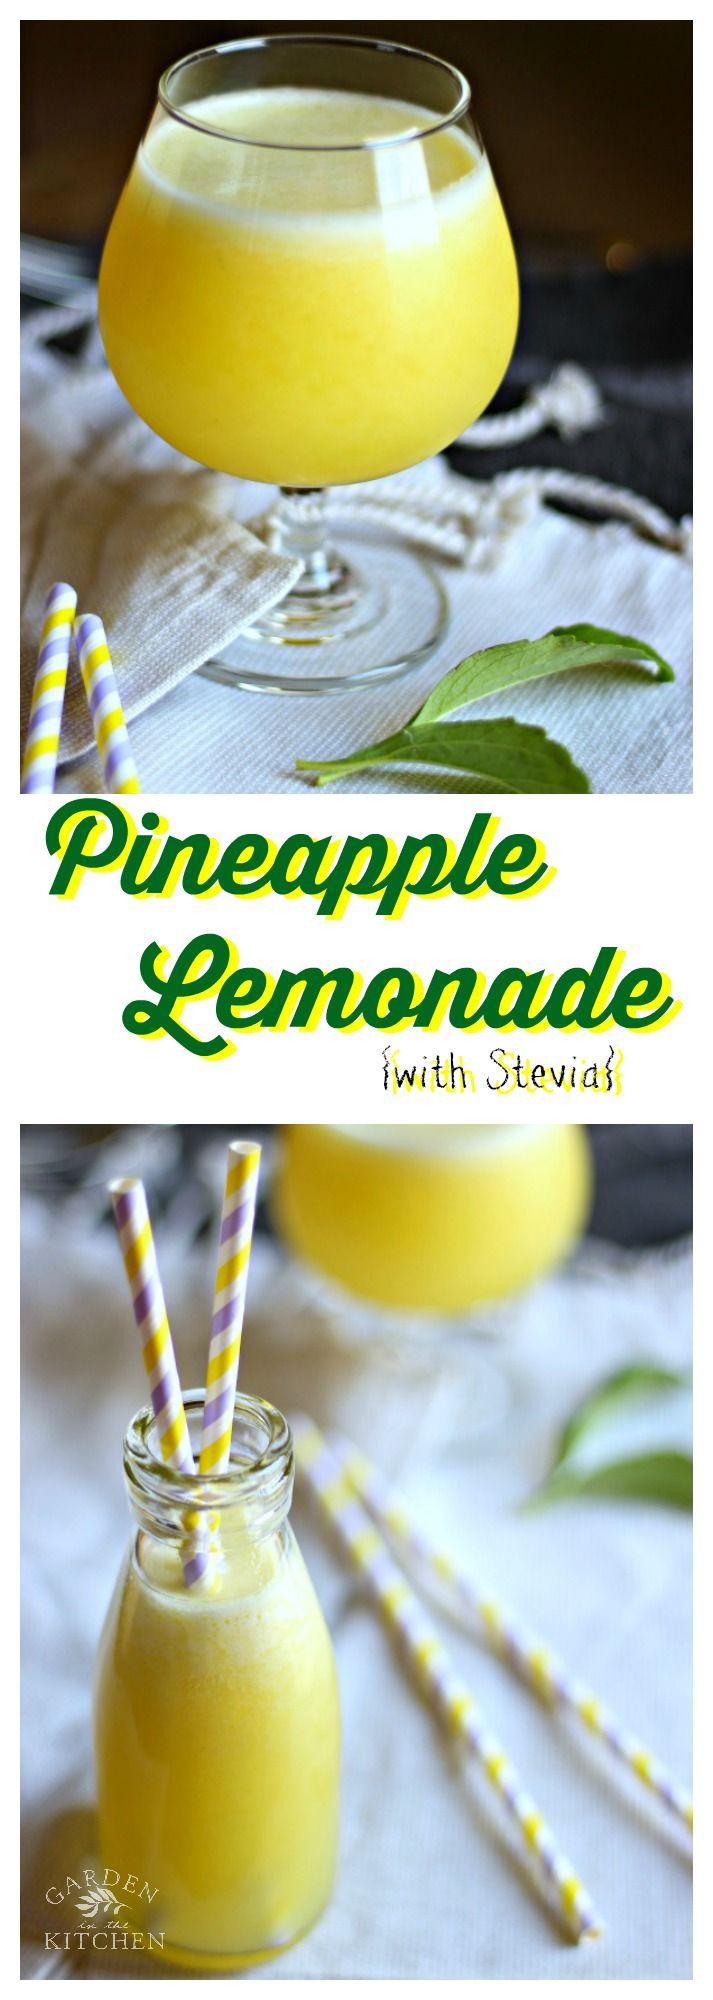 Pineapple Lemonade Recipe Pineapple Lemonade Refreshing